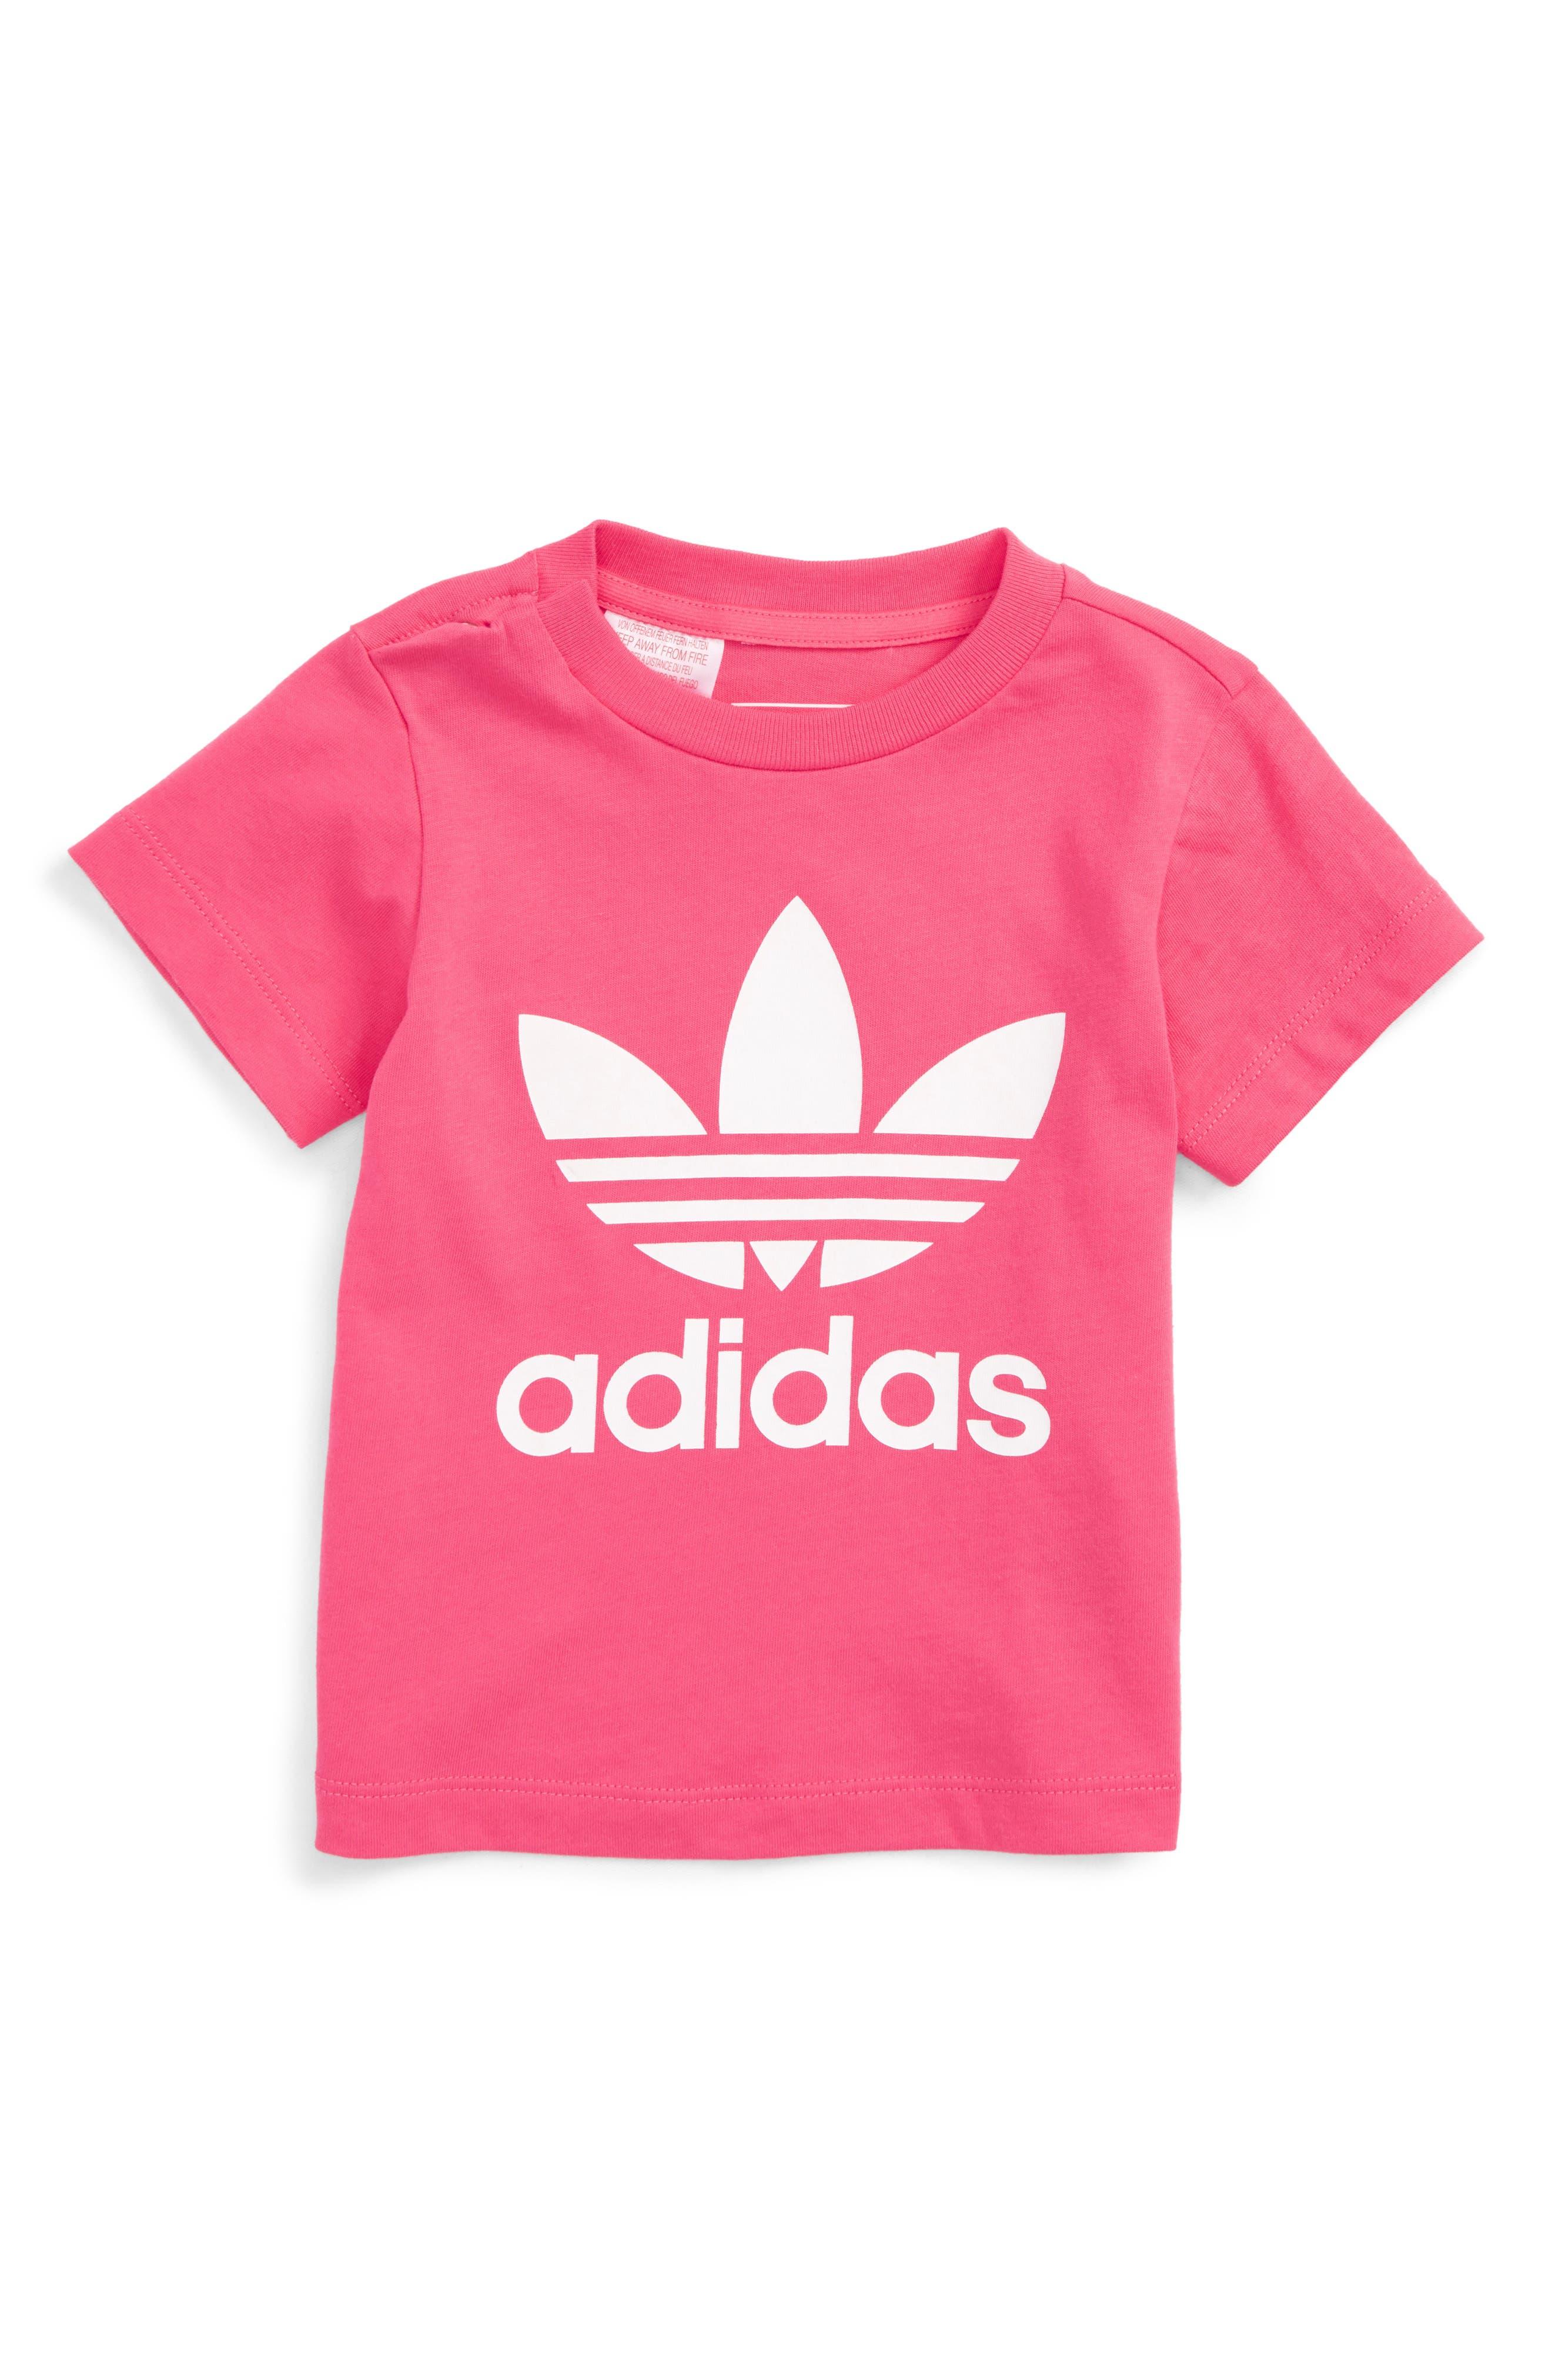 t shirt adidas per bambini: activewear & scarpe nordstrom